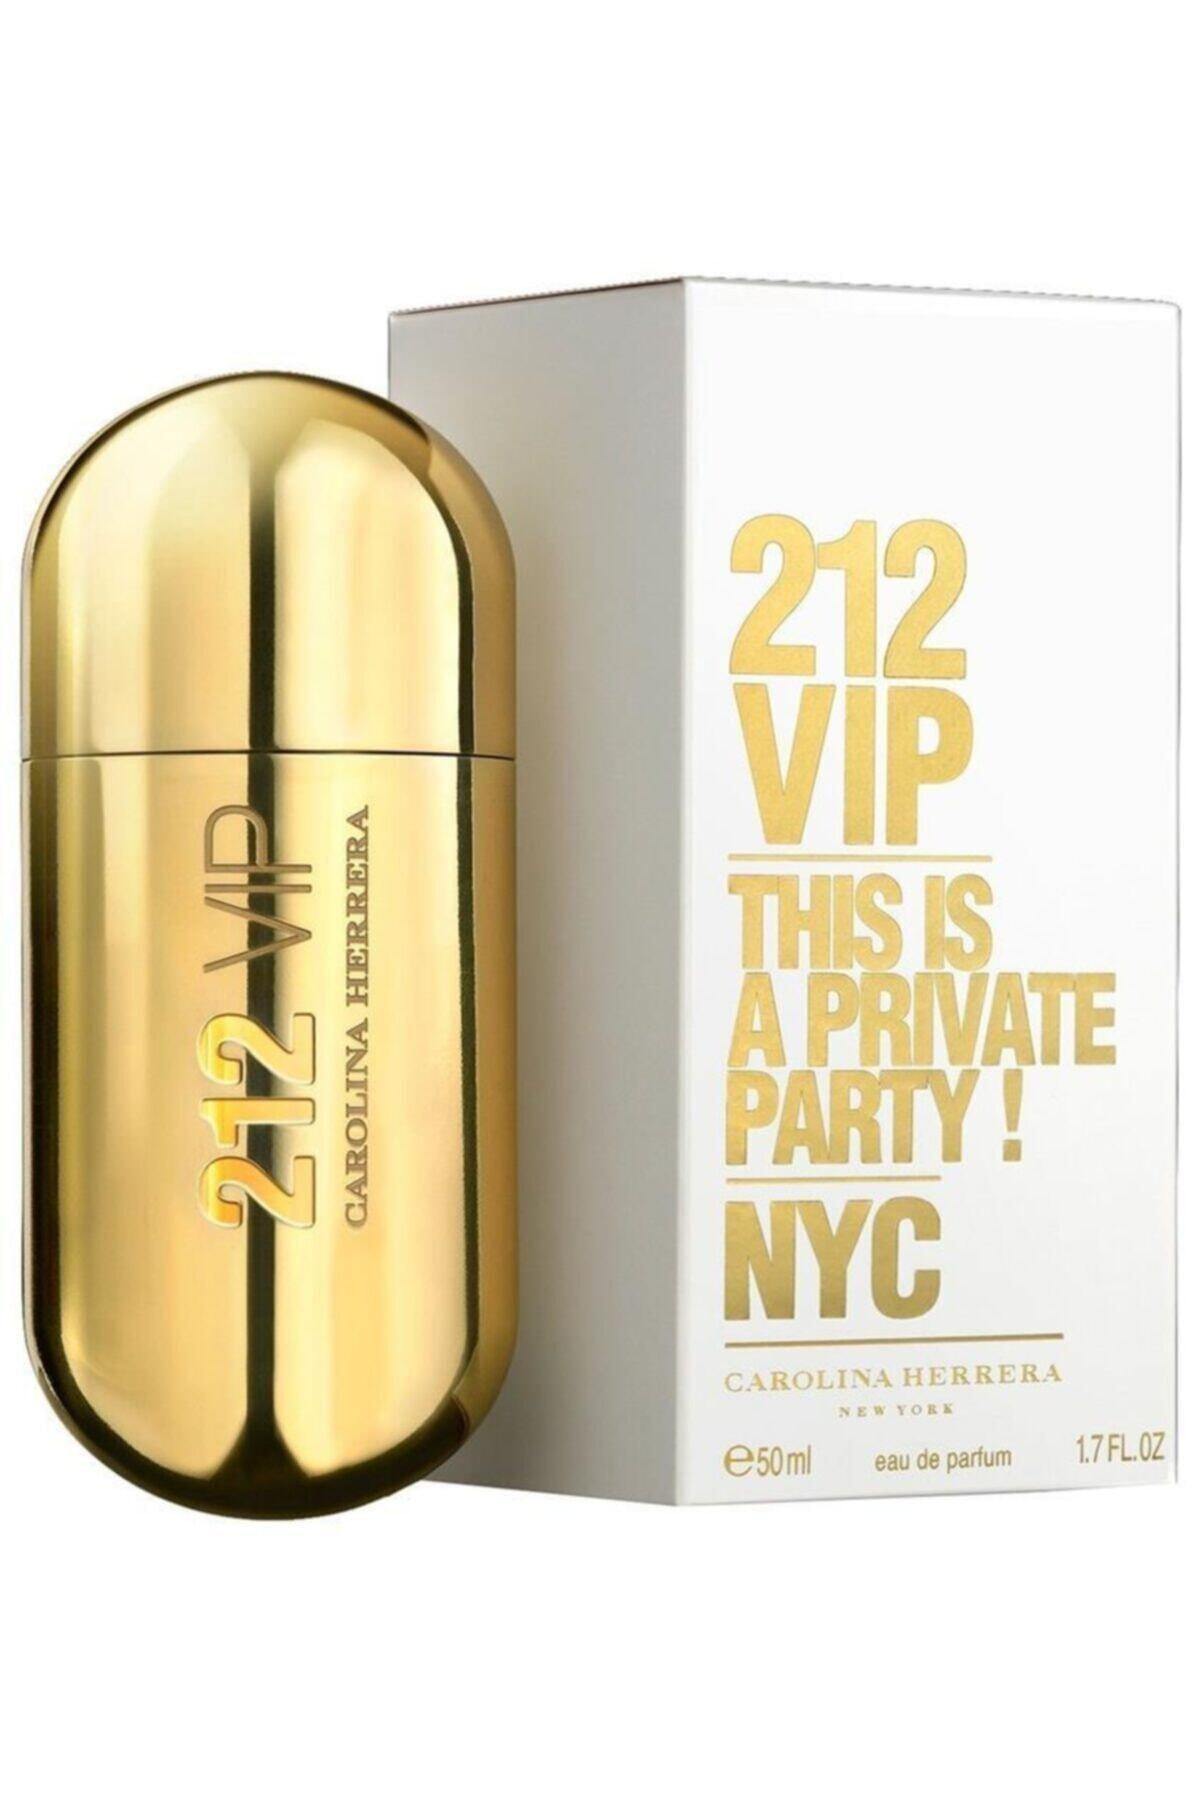 Carolina Herrera 212 Vıp Edp 50 ml Kadın Parfüm  8411061711804 1